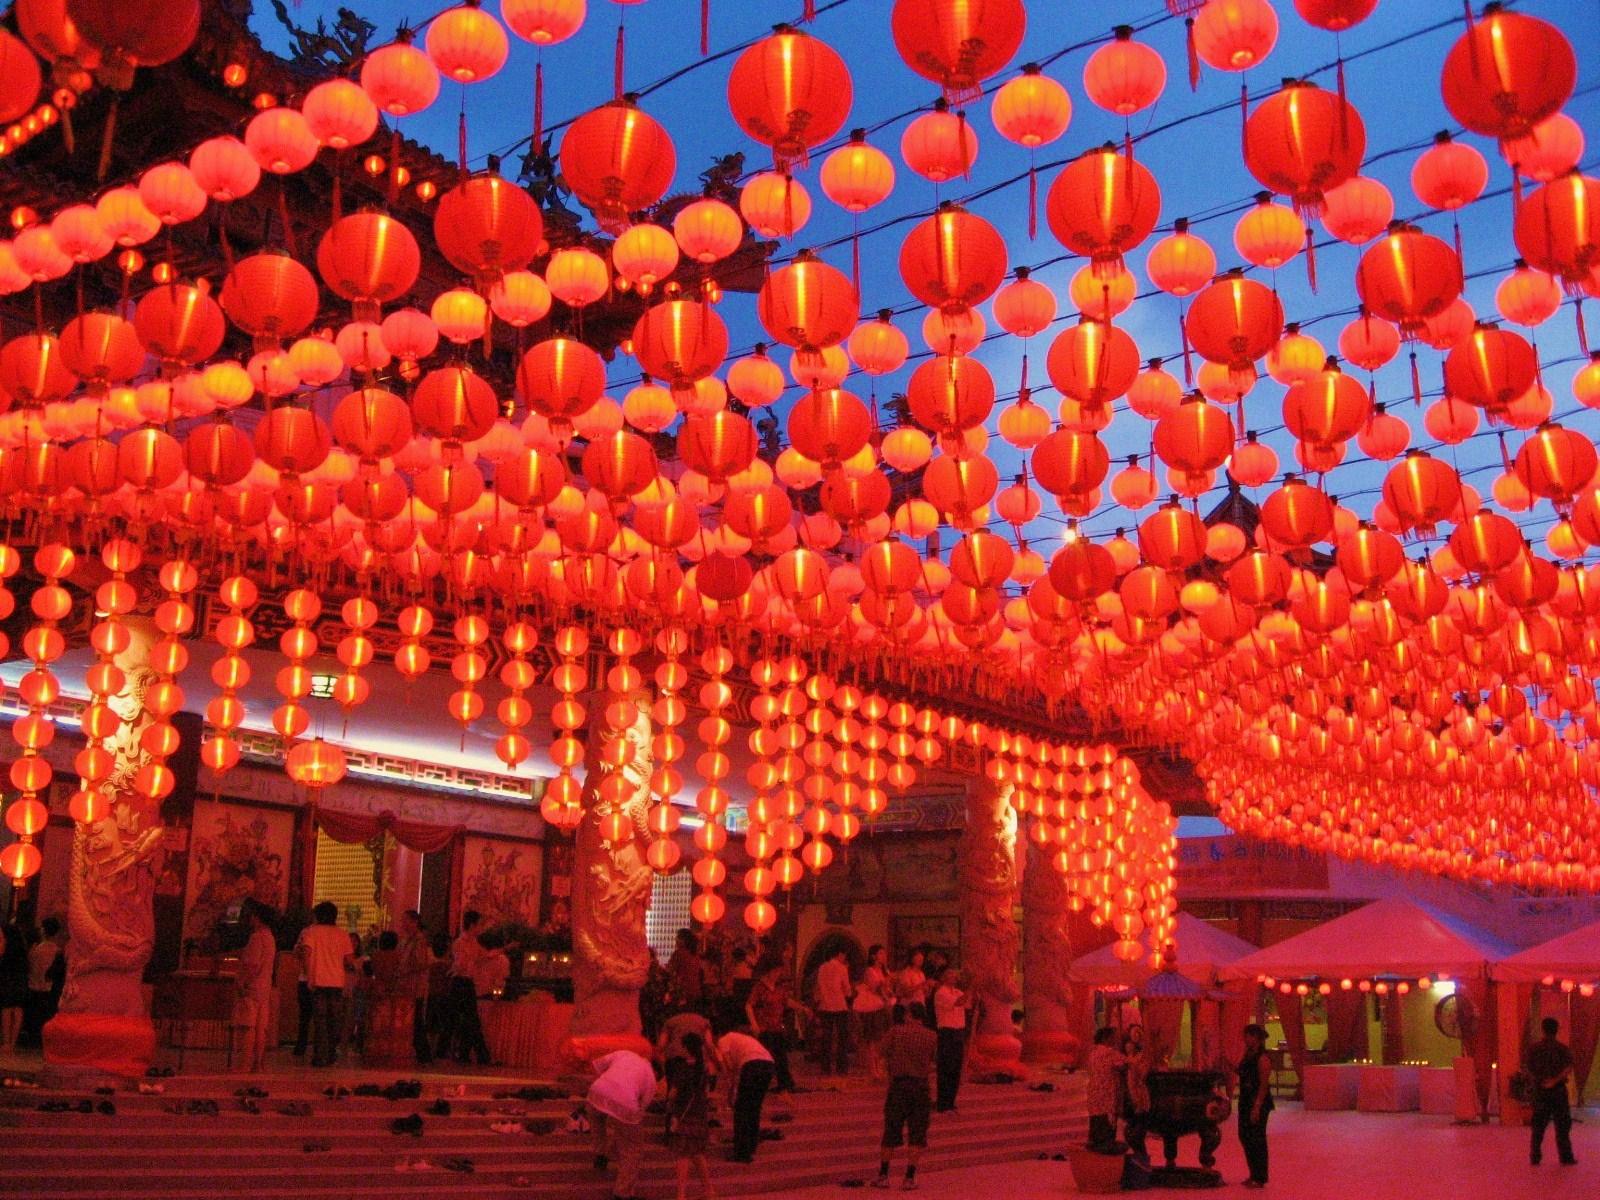 Grupo li po c mo celebr el fin de a o lunar por lin yutang - Que dias dan mala suerte en la cultura china ...